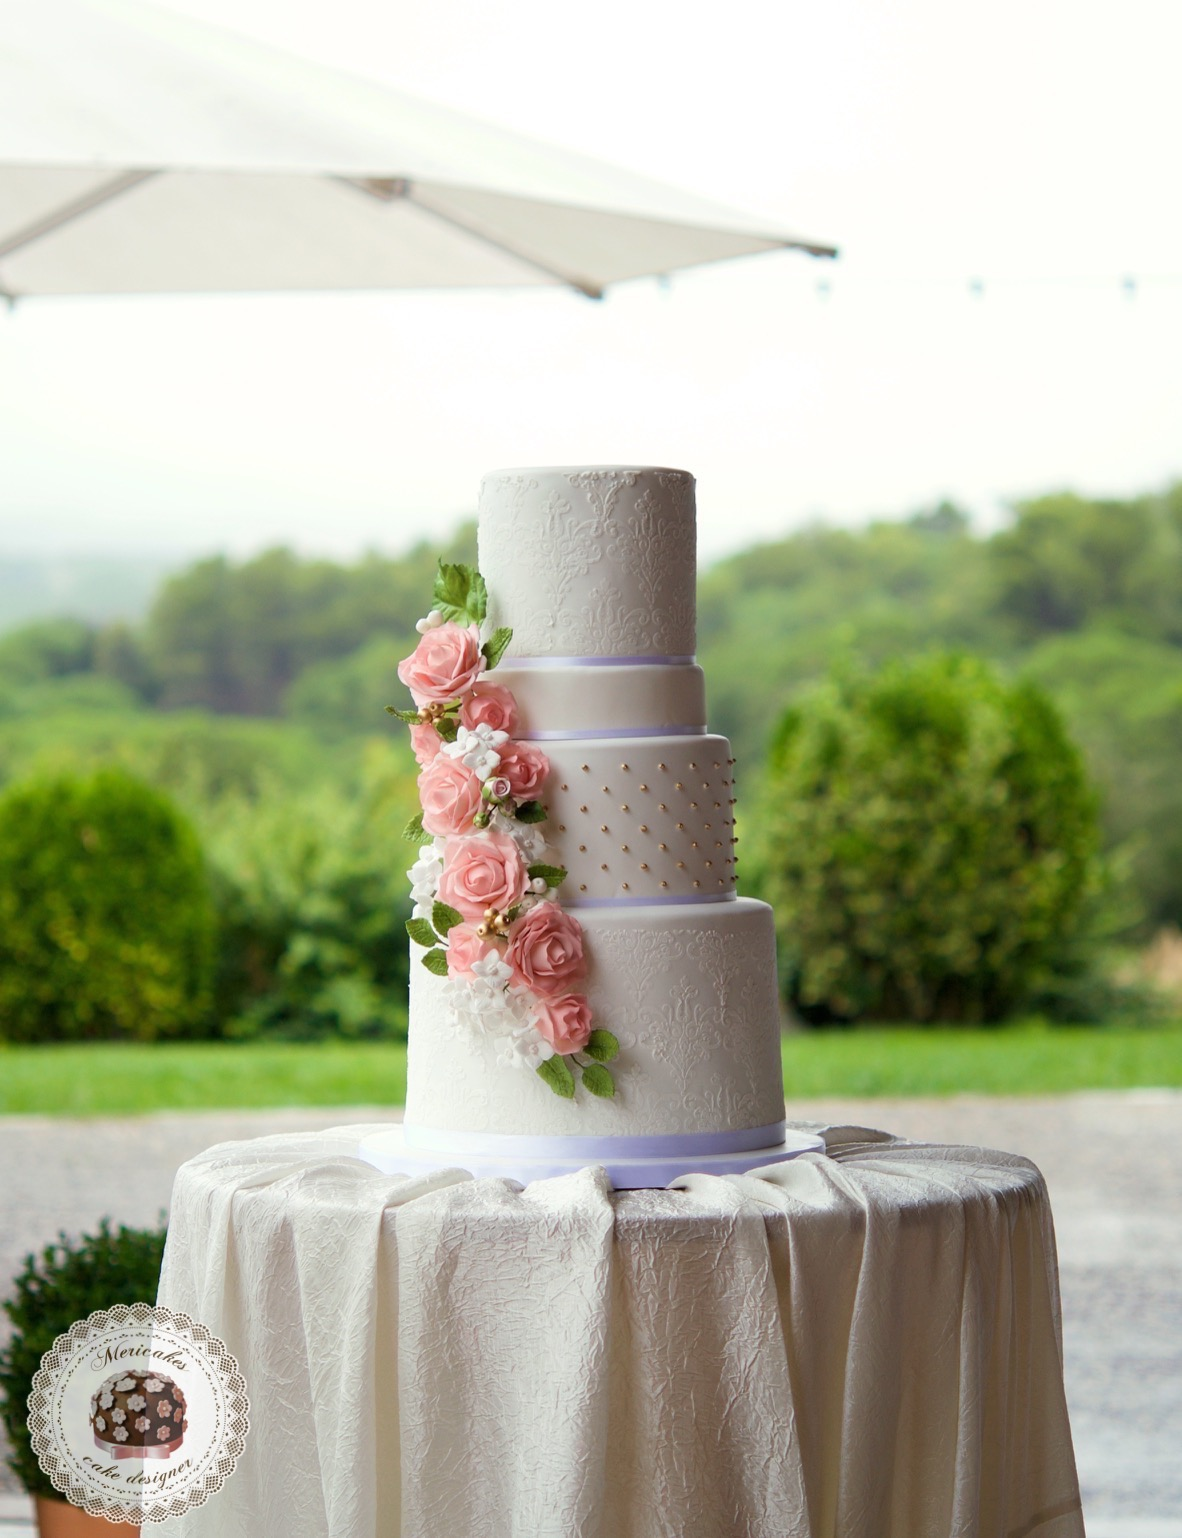 WEDDING CAKE, tarta de boda, cake artist, damask, sugar flowers, flores de aucar, hortensias, rosas, lemon curd, fondant, barcelona, mericakes 1